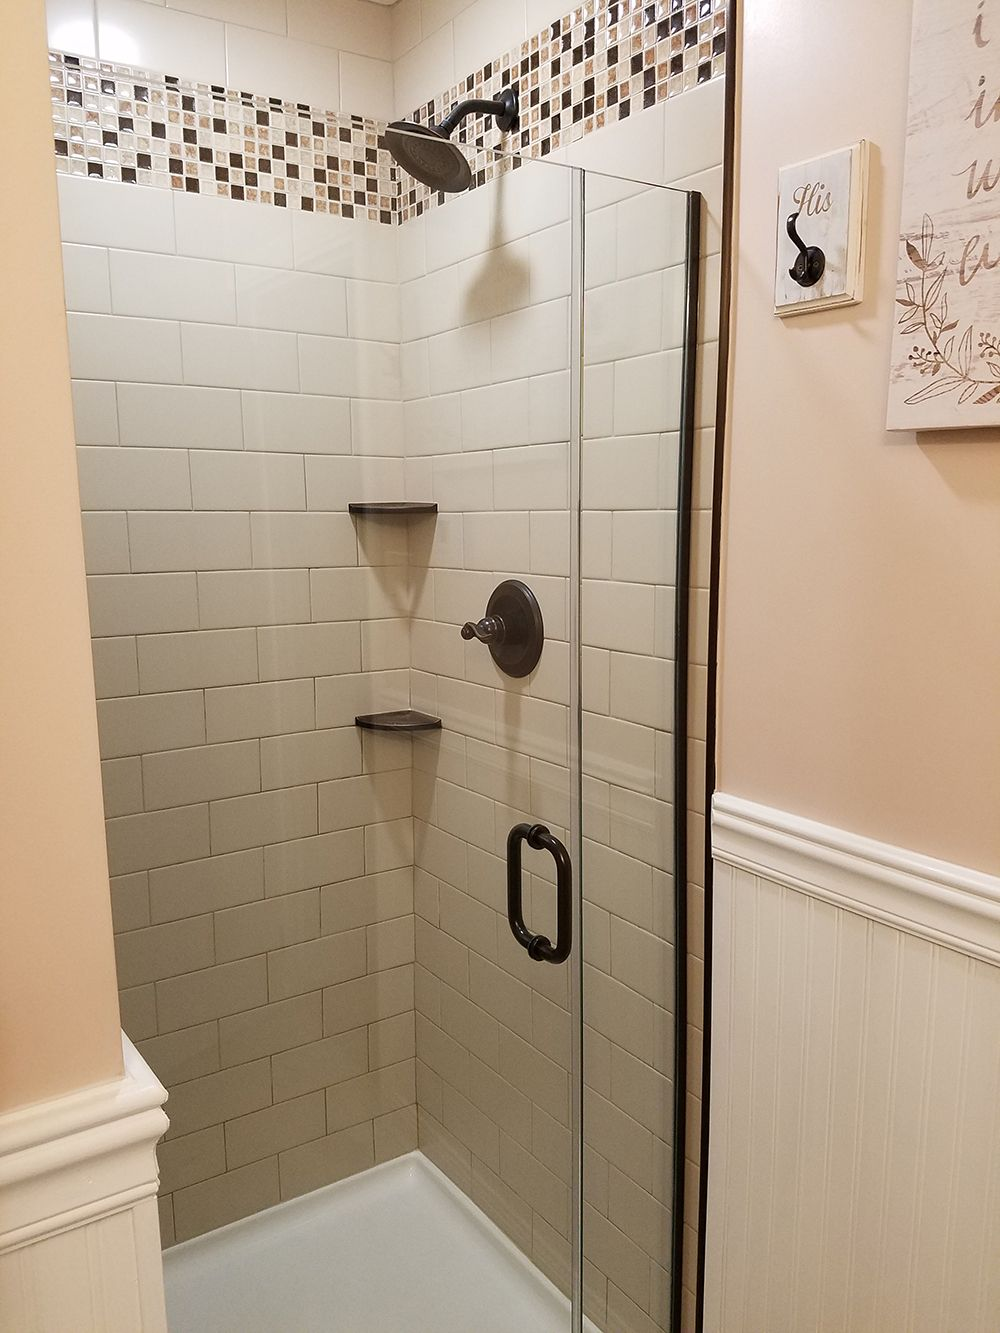 rustic farmhouse bathroom wall tile is